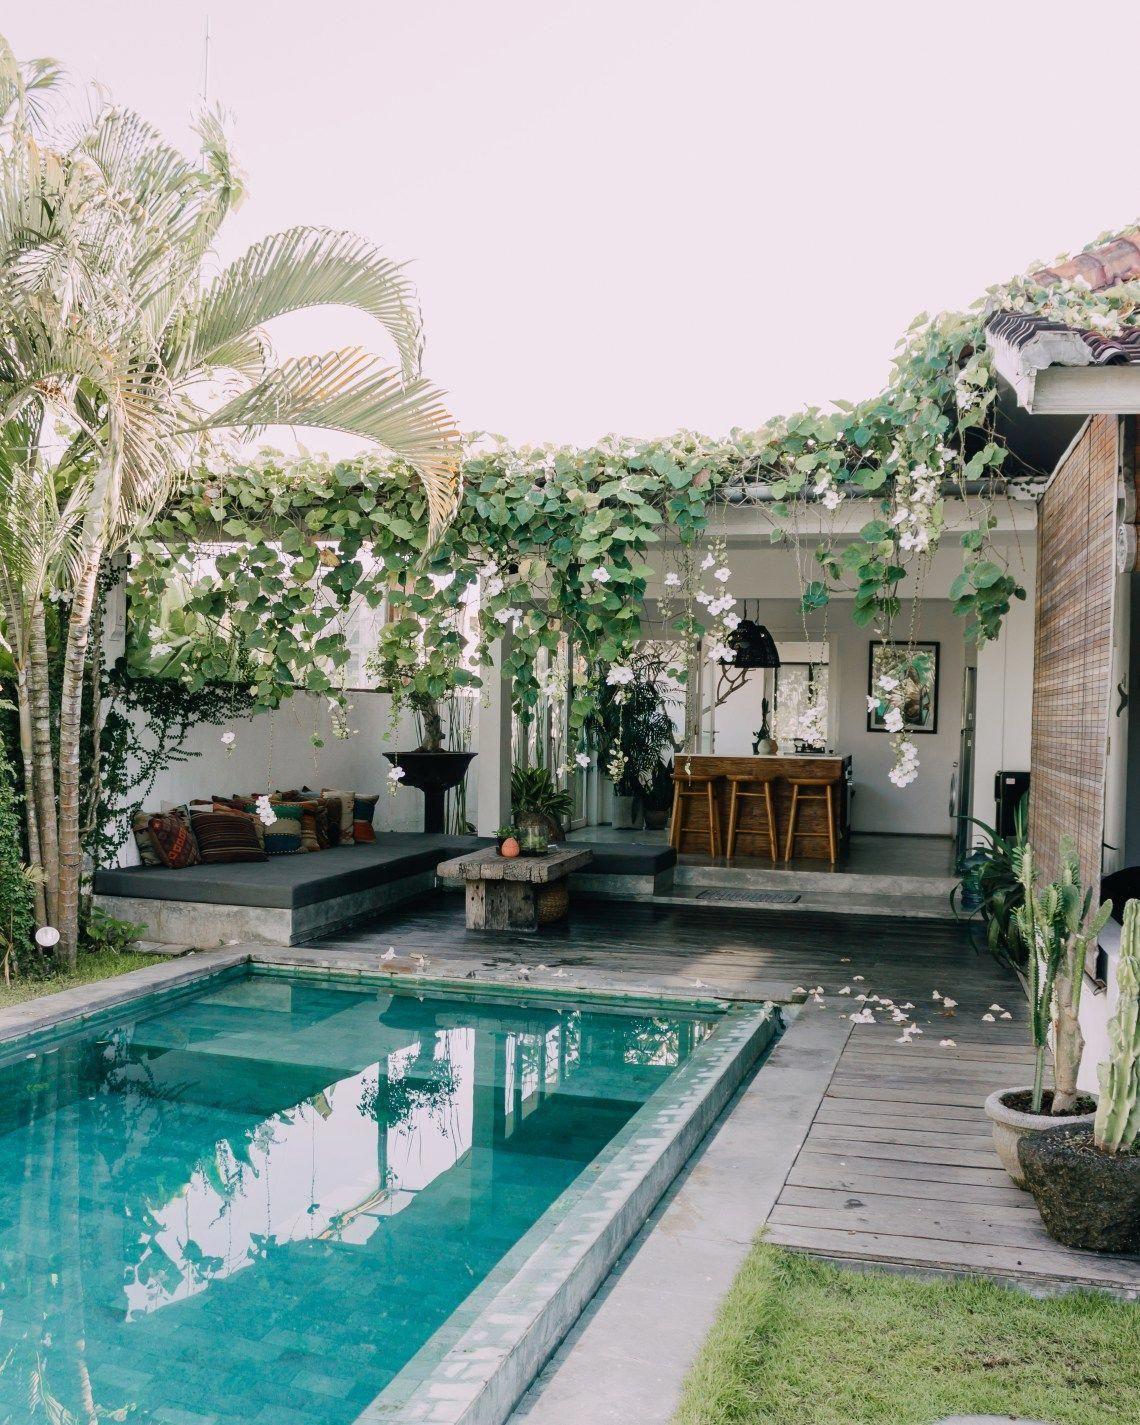 Bali Outdoor Living Space Outdoorlivingroom Backyard Pool Designs Small Backyard Design Swimming Pools Backyard